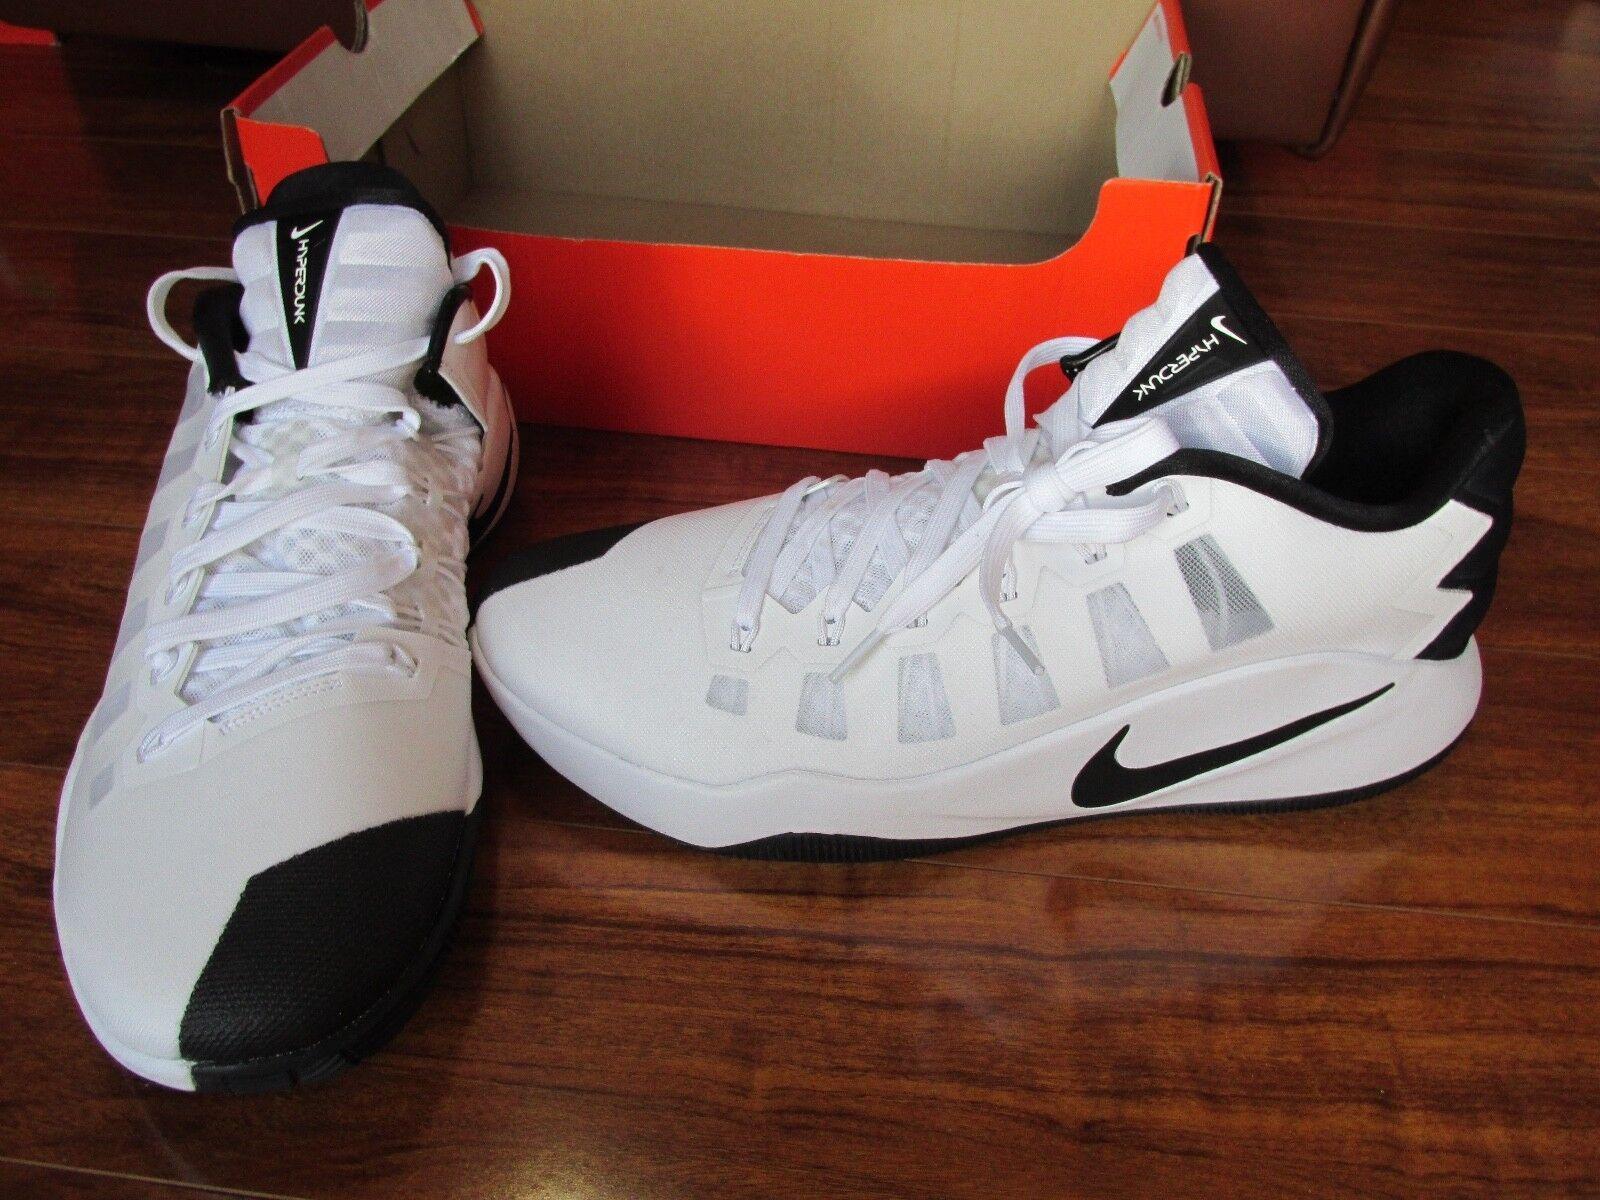 NEW Nike Hyperdunk 2016 LOW Basketball Shoe MENS 13 White Black 844363-100 Price reduction